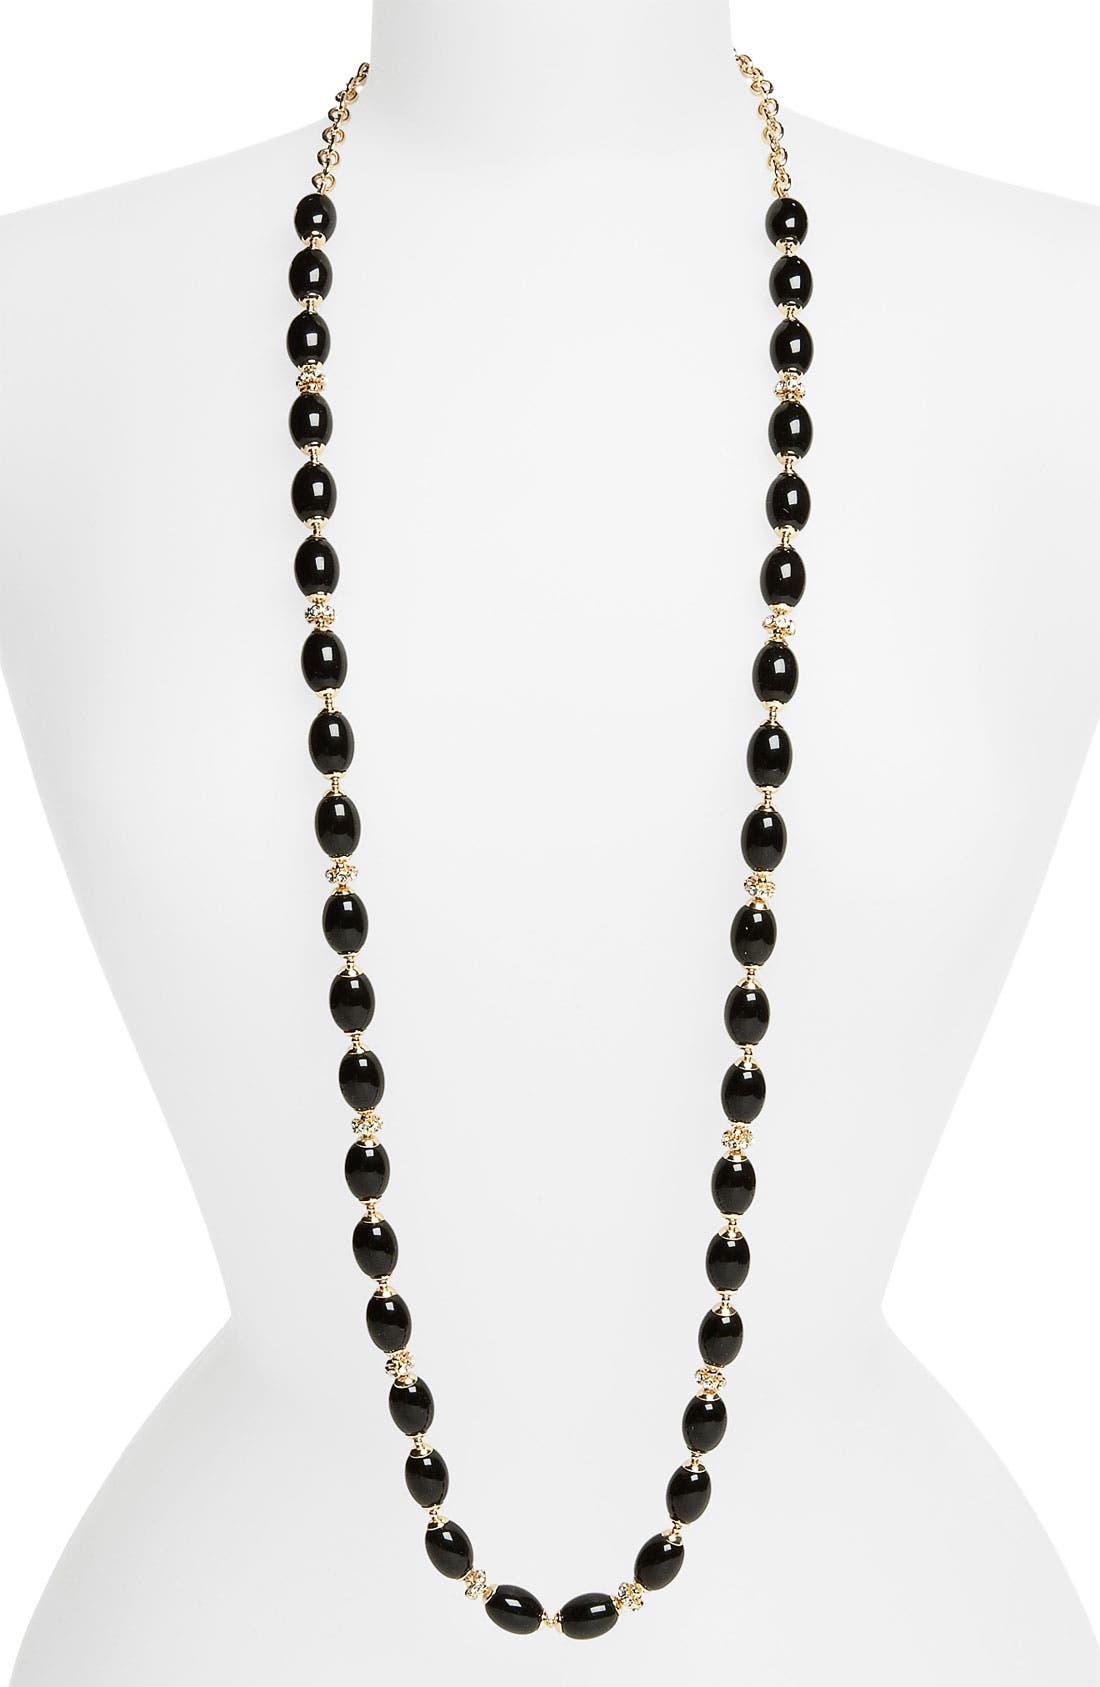 Alternate Image 1 Selected - Anne Klein 'Alder' Extra Long Bead Necklace